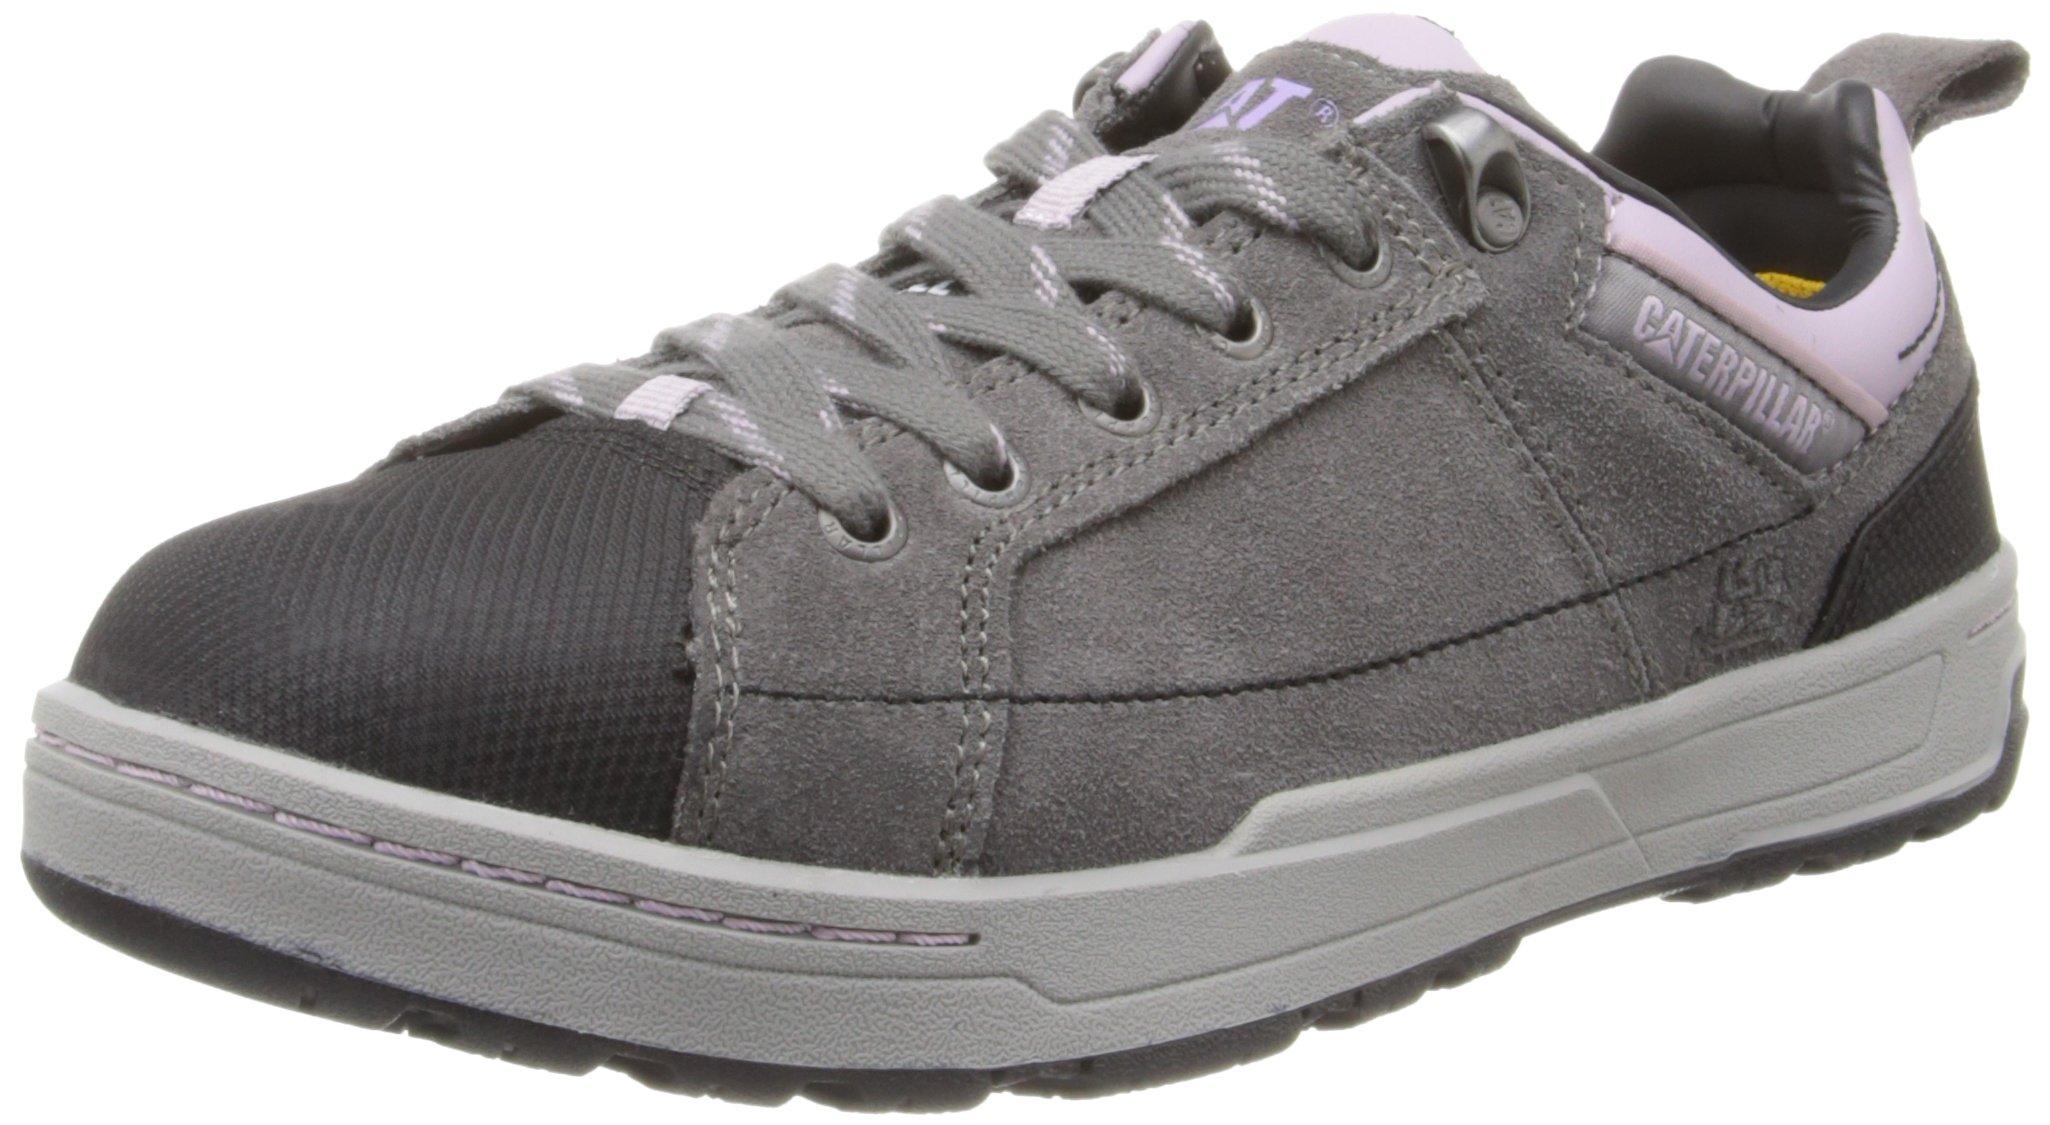 Caterpillar Women's Brode Steel Toe Work Shoe,Grey,9 W US